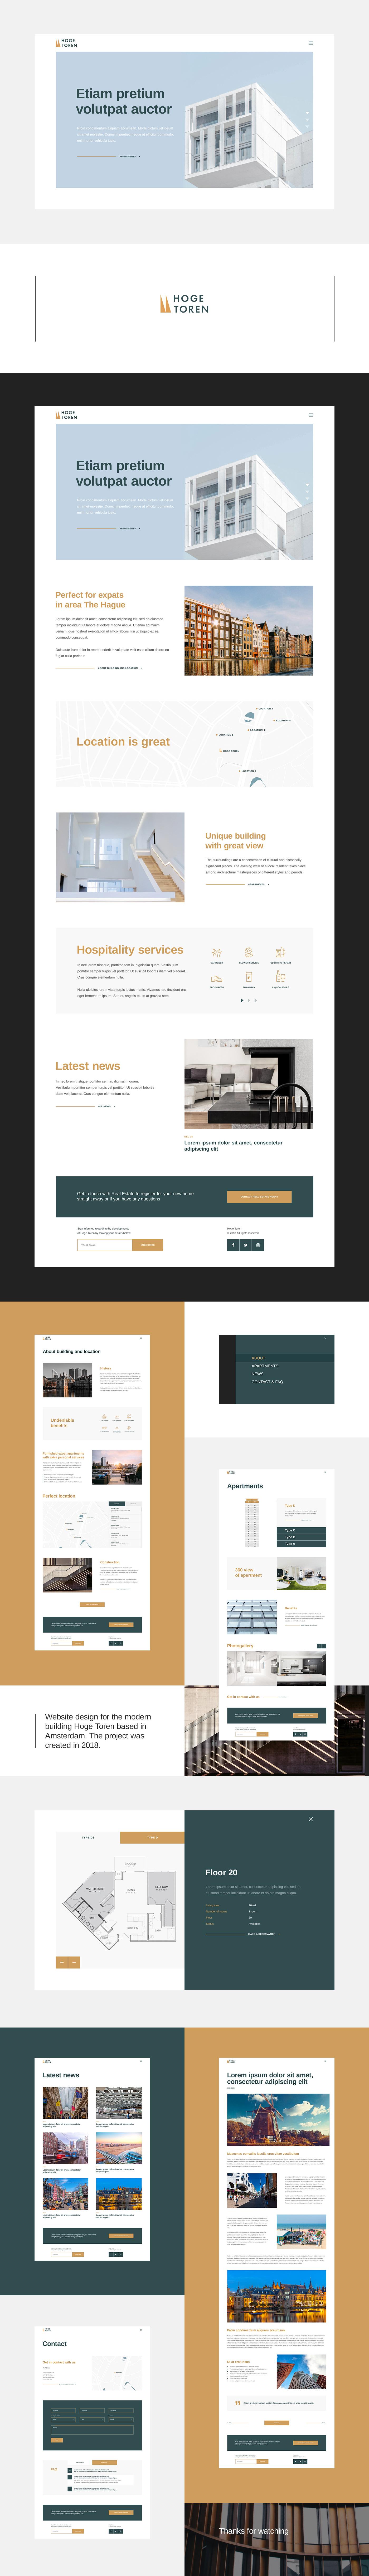 architecture ux UI design modern clean concept landingpage promosite Webdesign